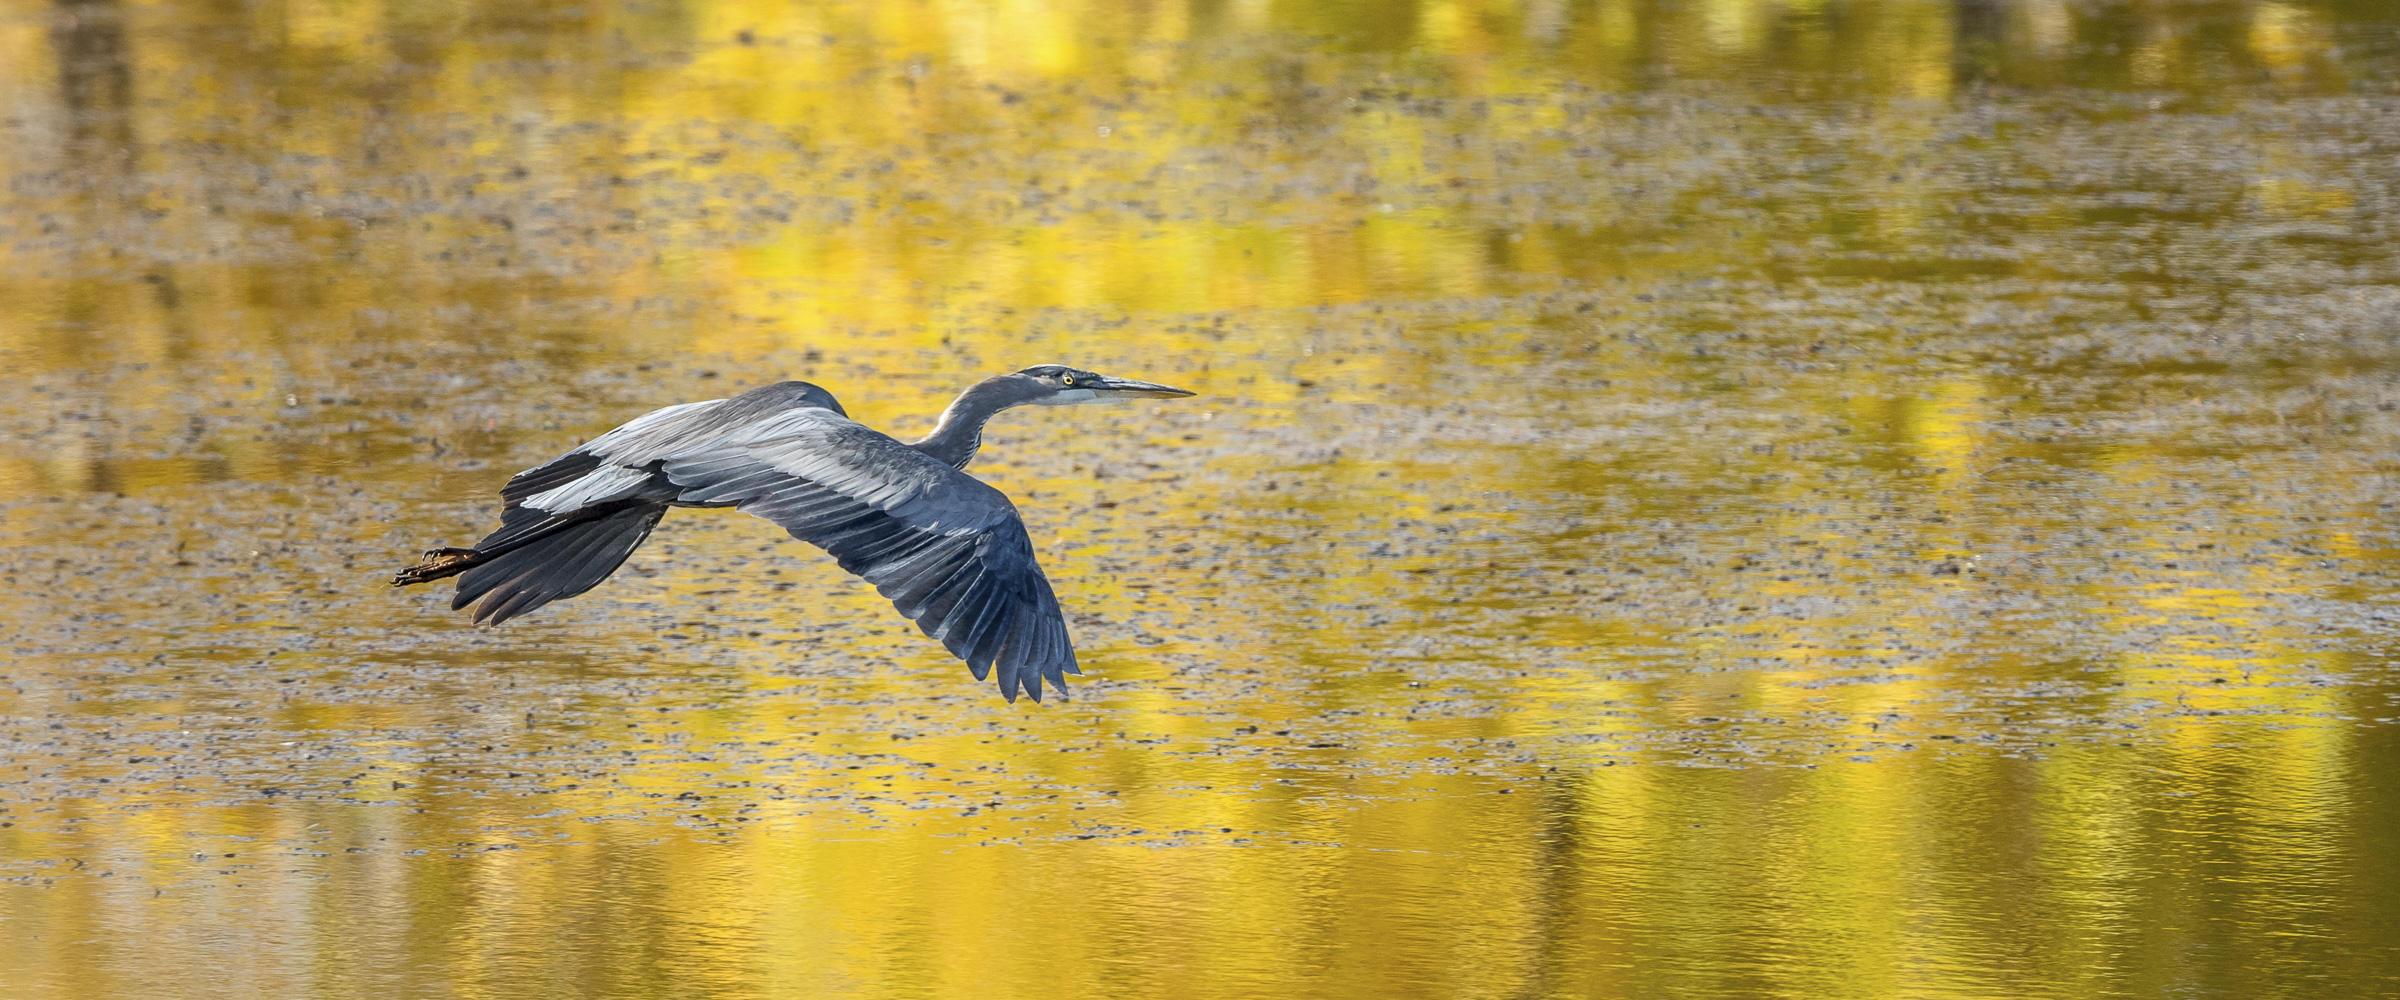 Great Blue Heron Audubon Rockies Western Rivers Initaitive